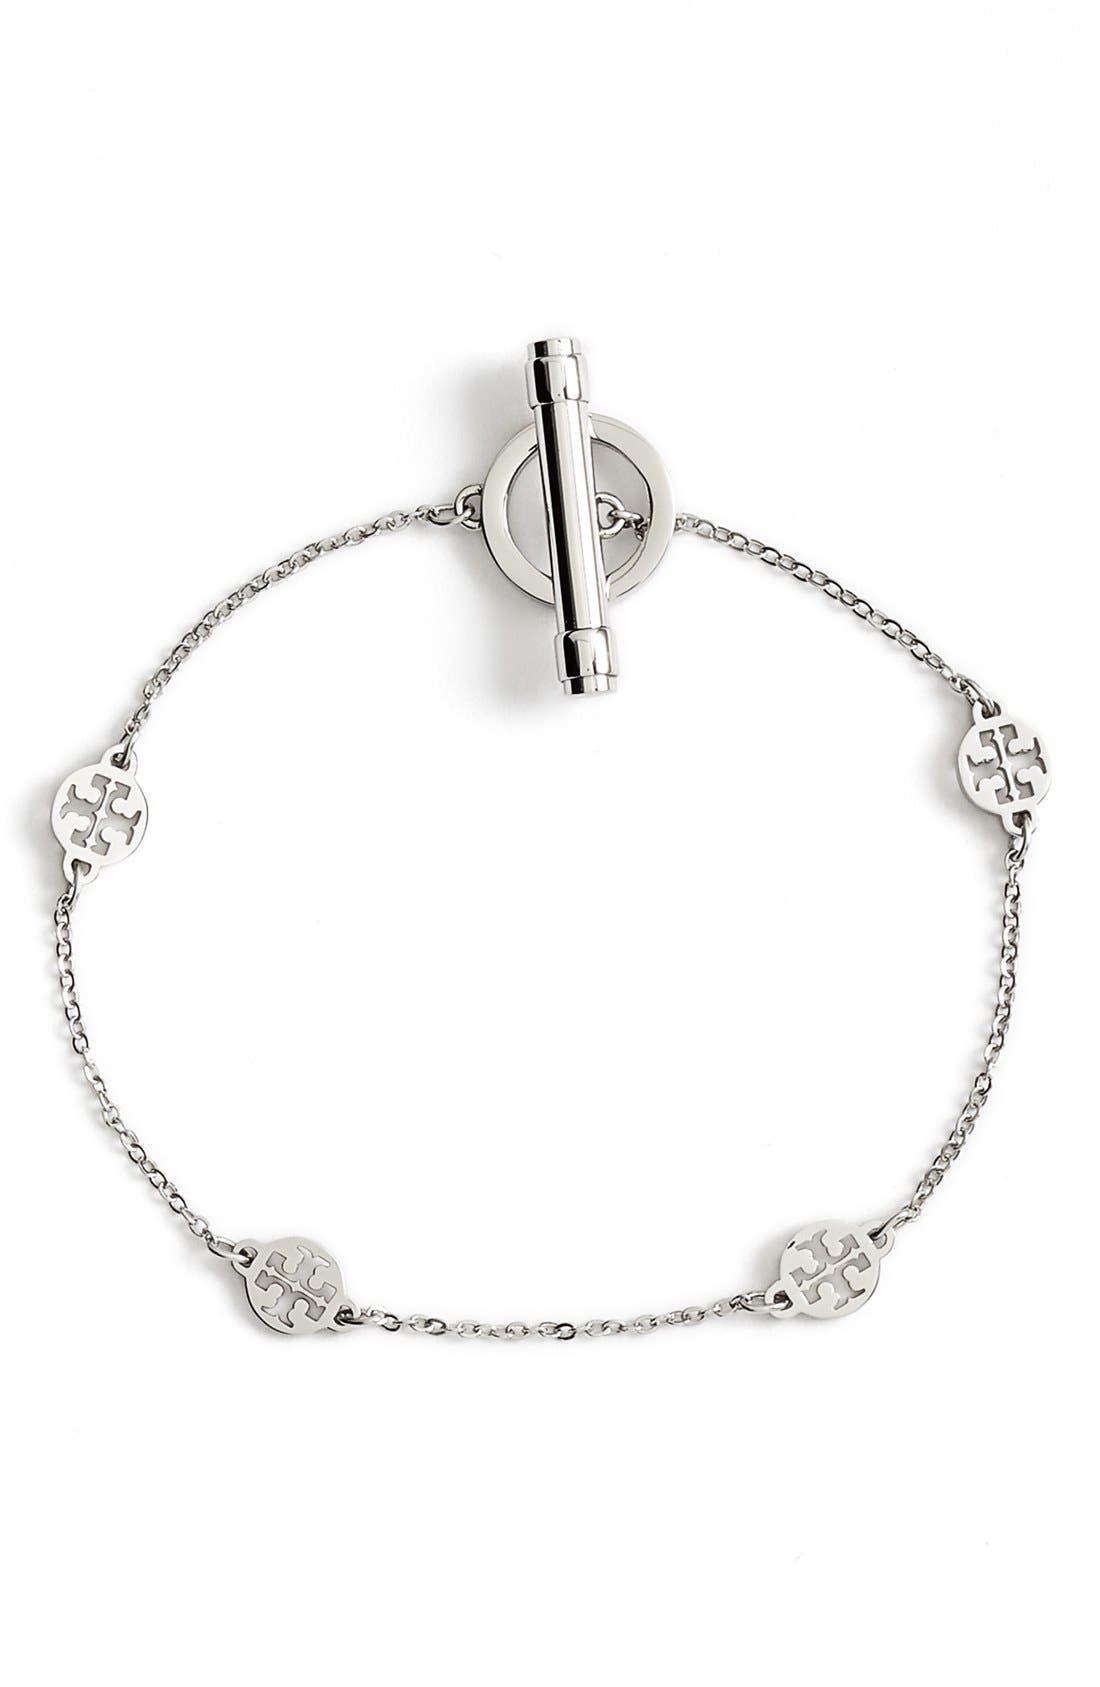 Alternate Image 1 Selected - Tory Burch Logo Station Toggle Bracelet